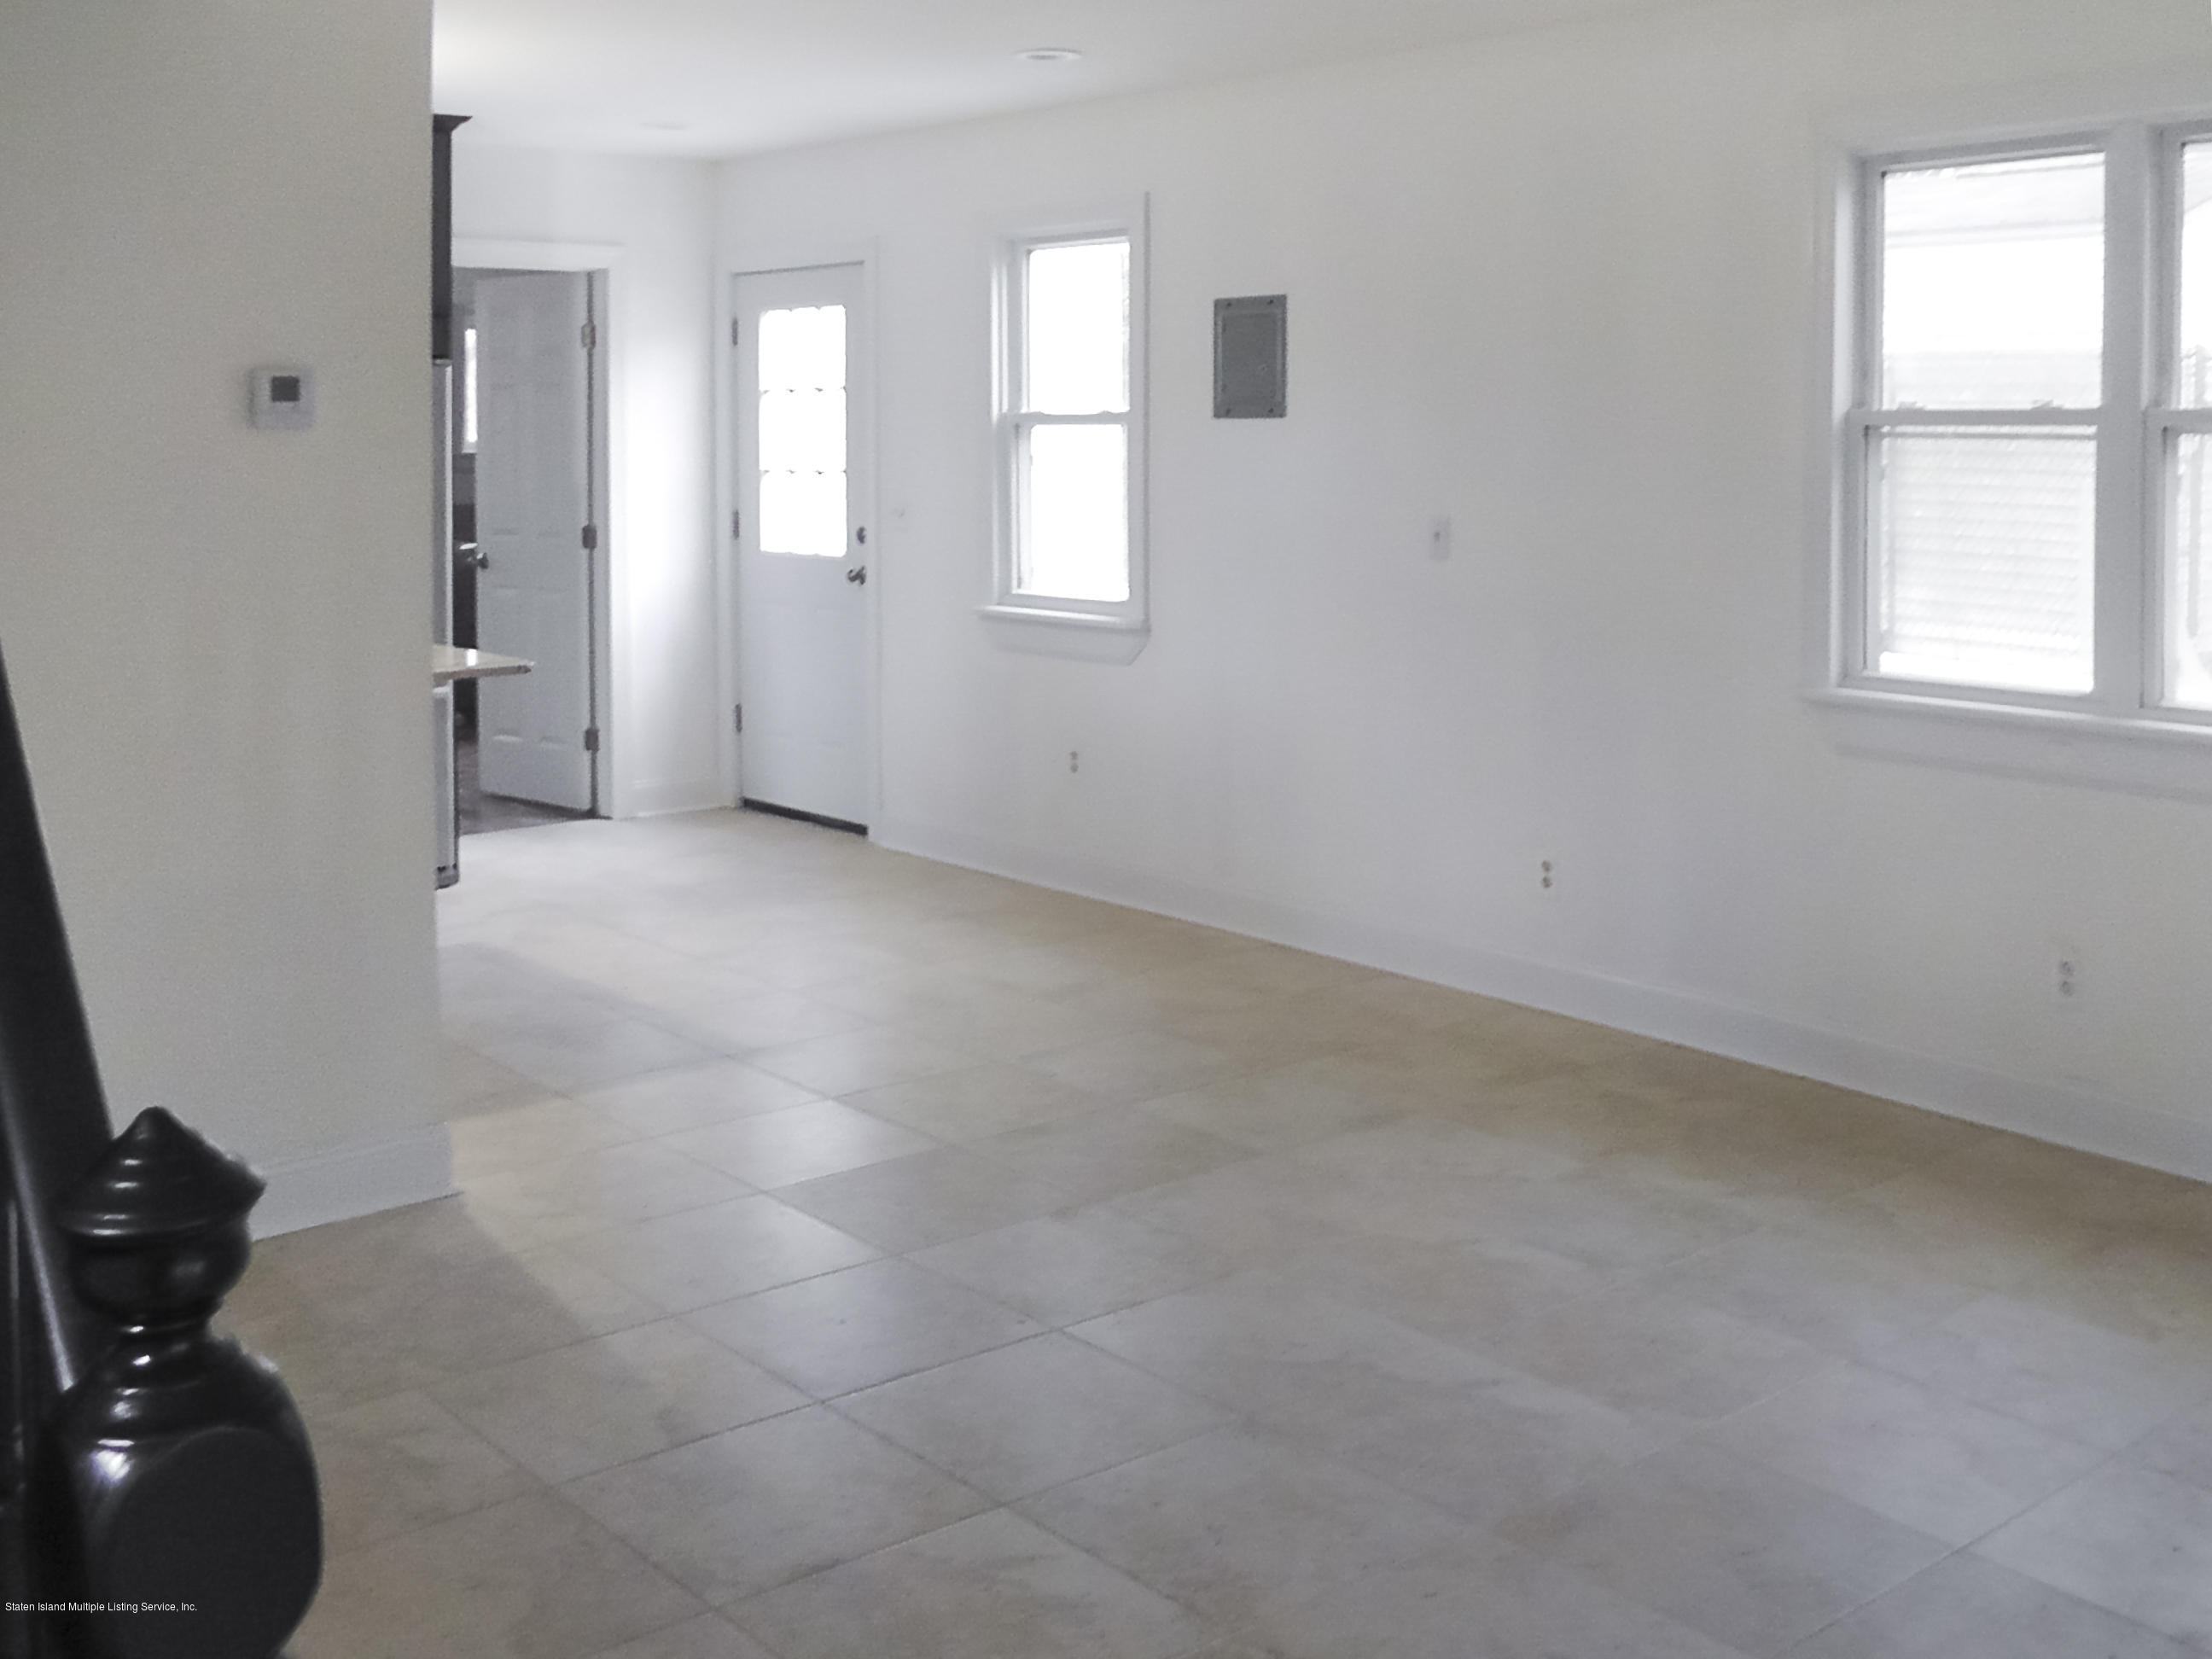 Single Family - Detached 153 Sampson Avenue  Staten Island, NY 10308, MLS-1137016-2